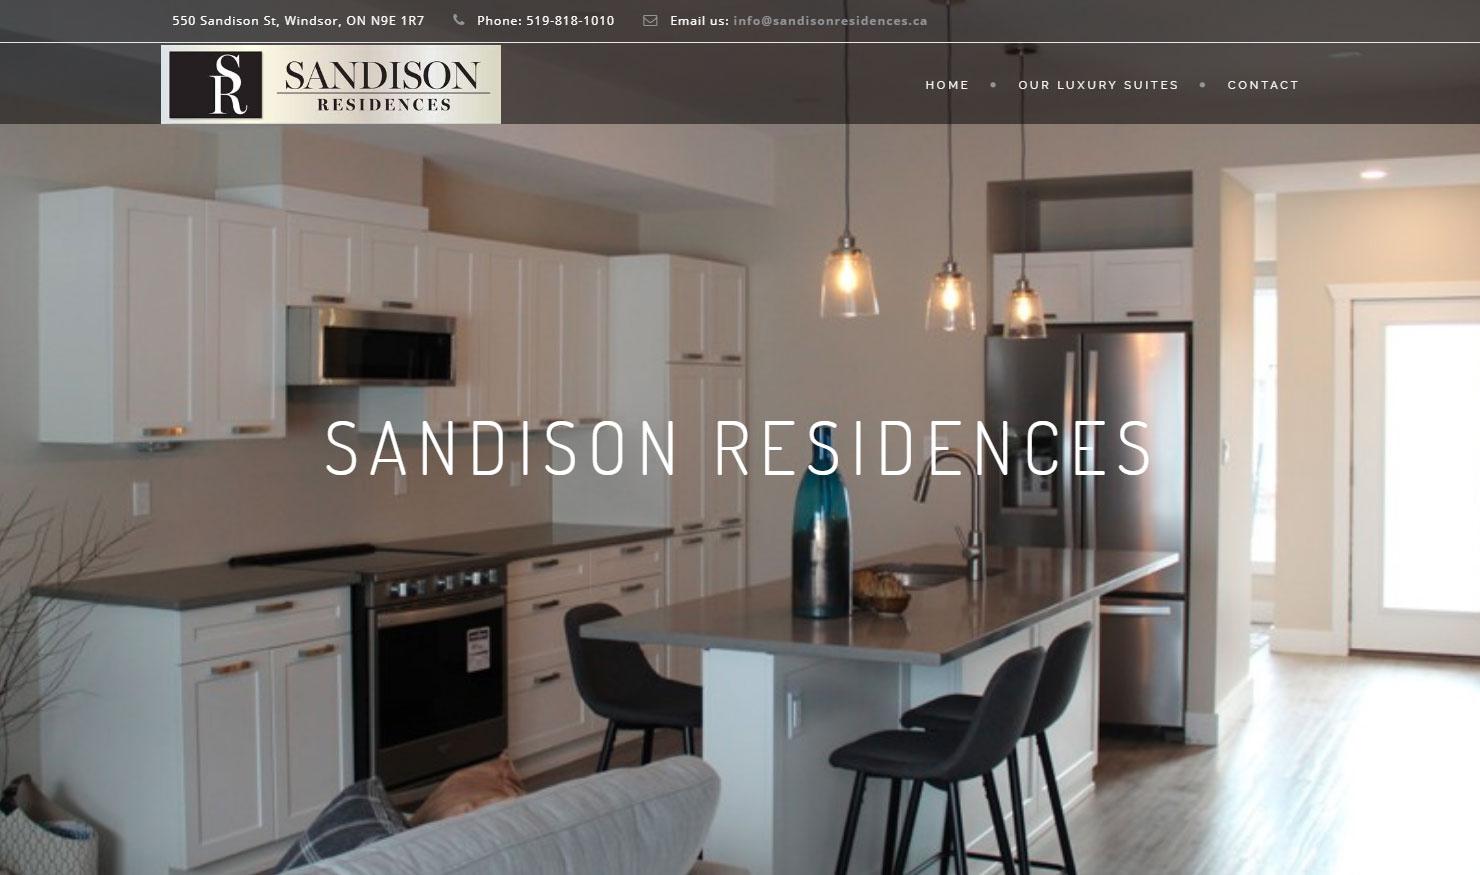 SandisonResidences-Website-Mediaduo